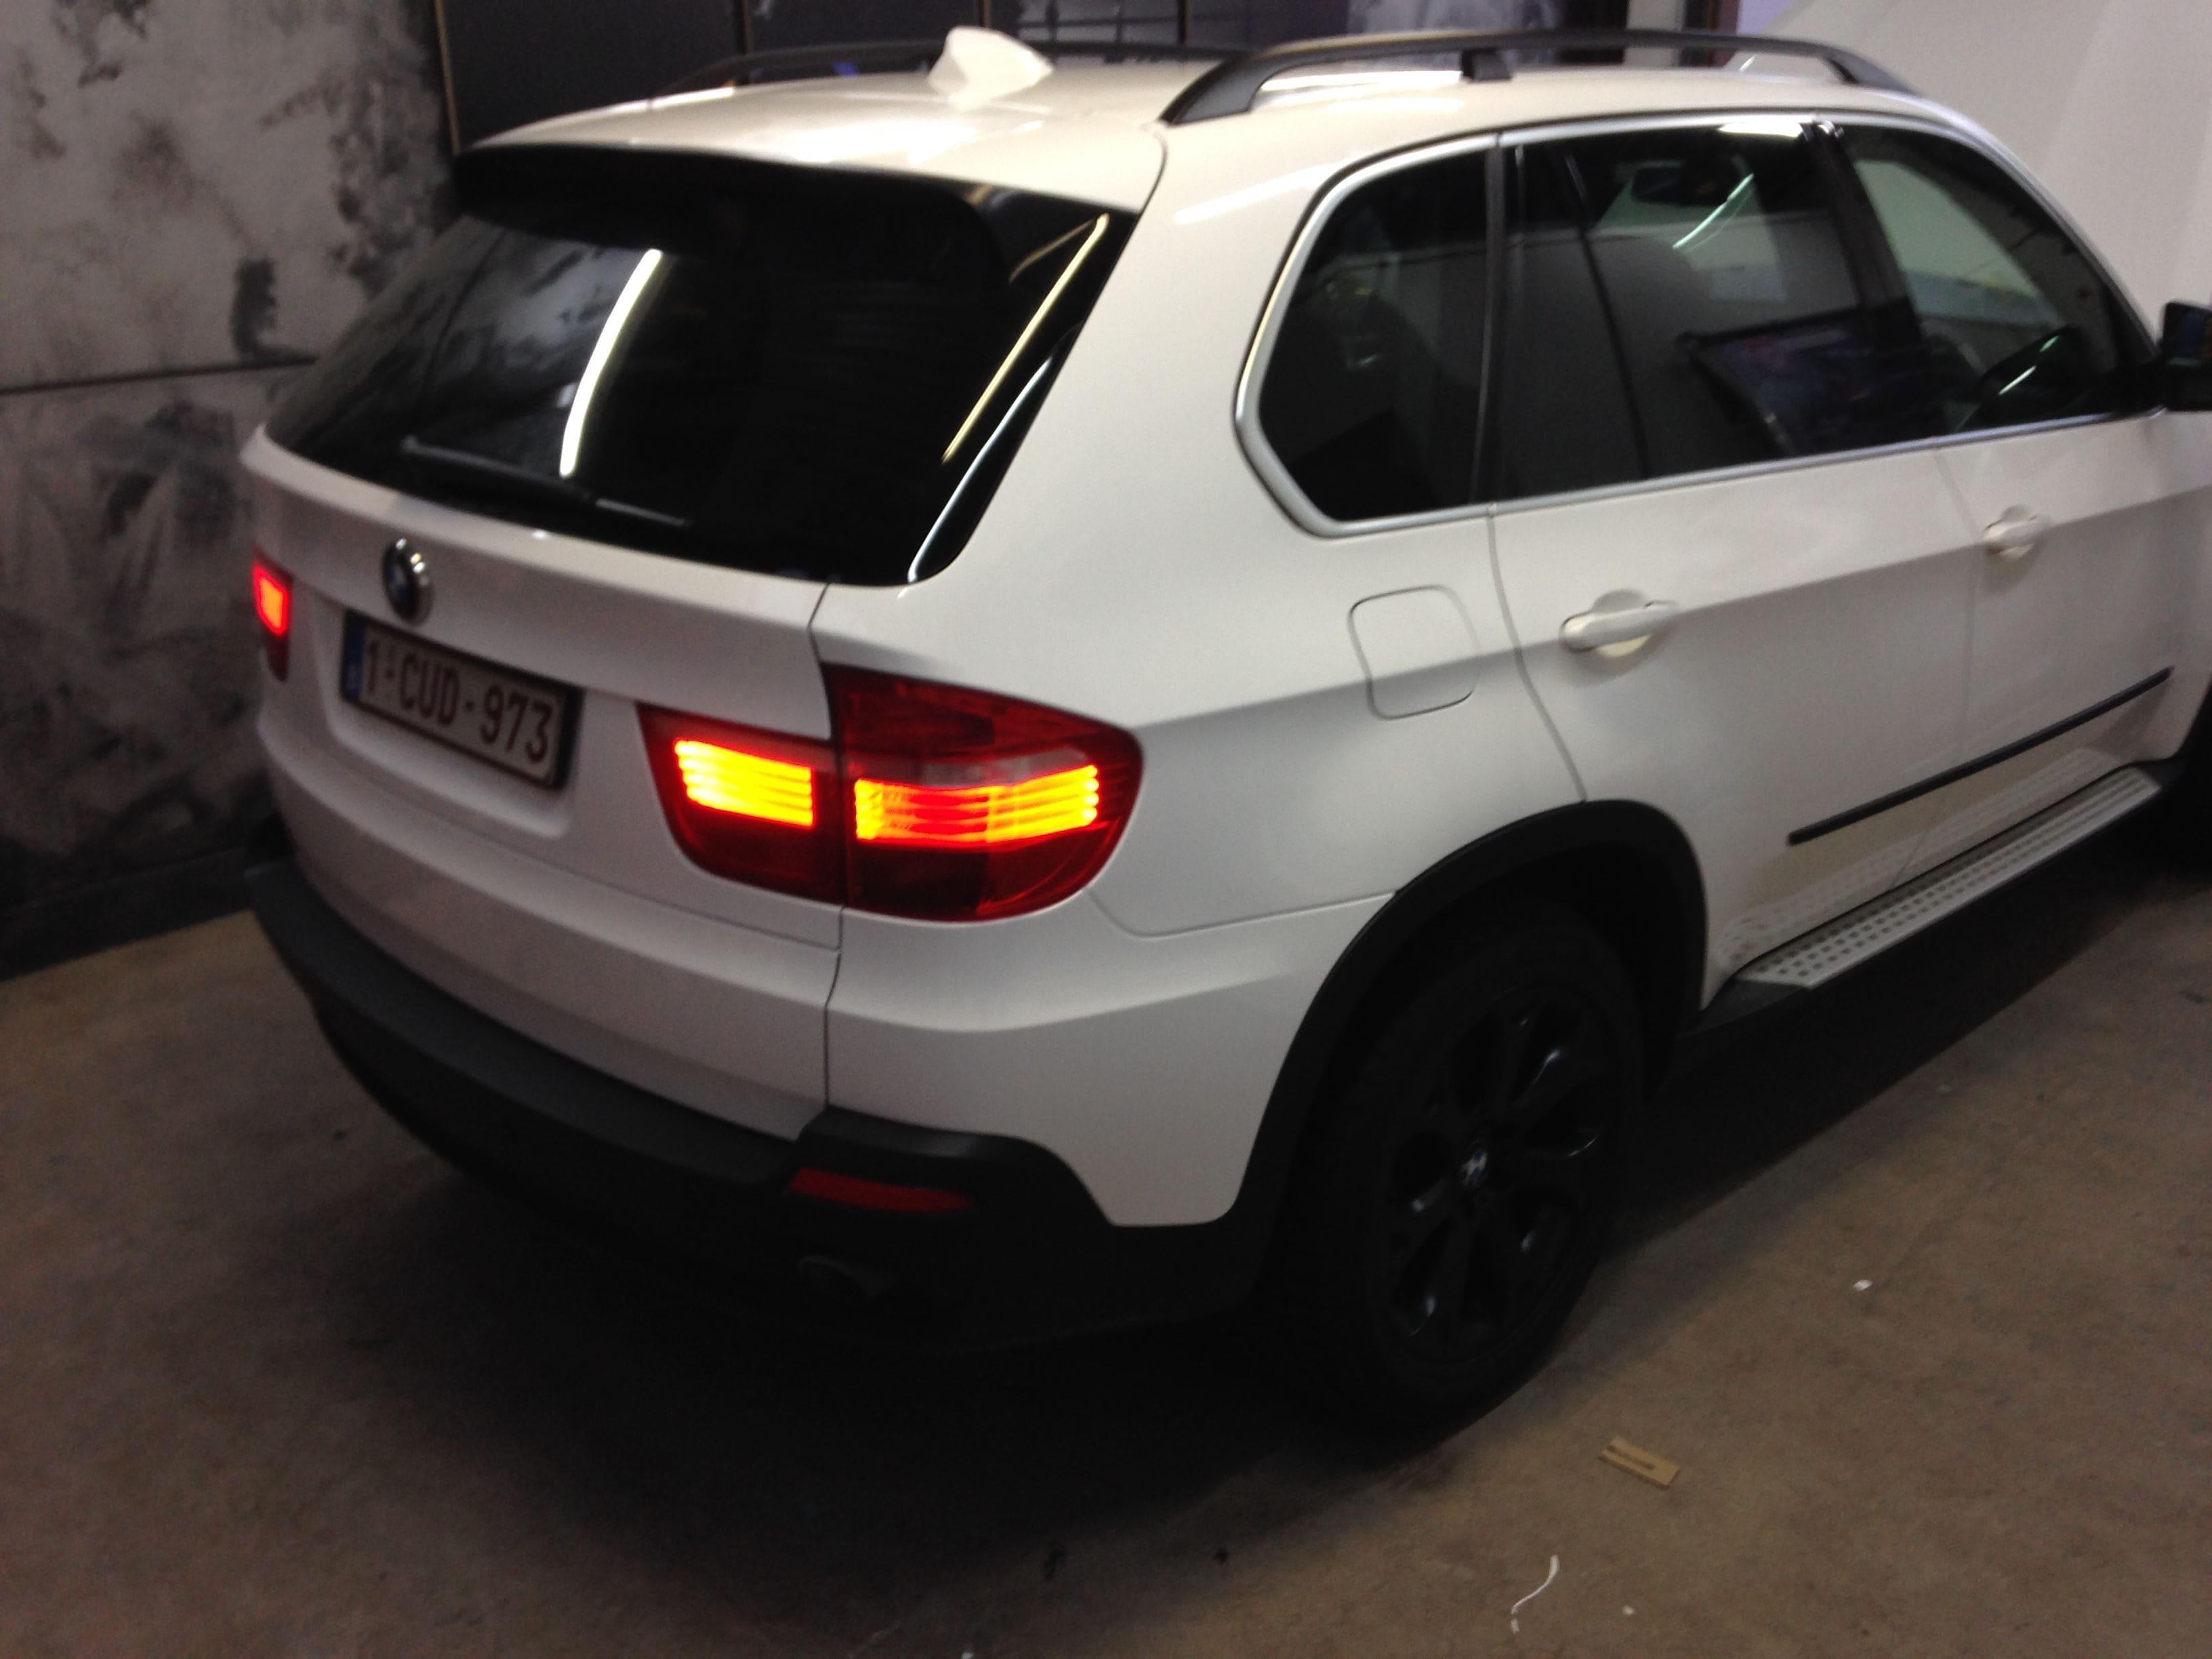 BMW X5 met Glossy White Wrap, Carwrapping door Wrapmyride.nu Foto-nr:5424, ©2021